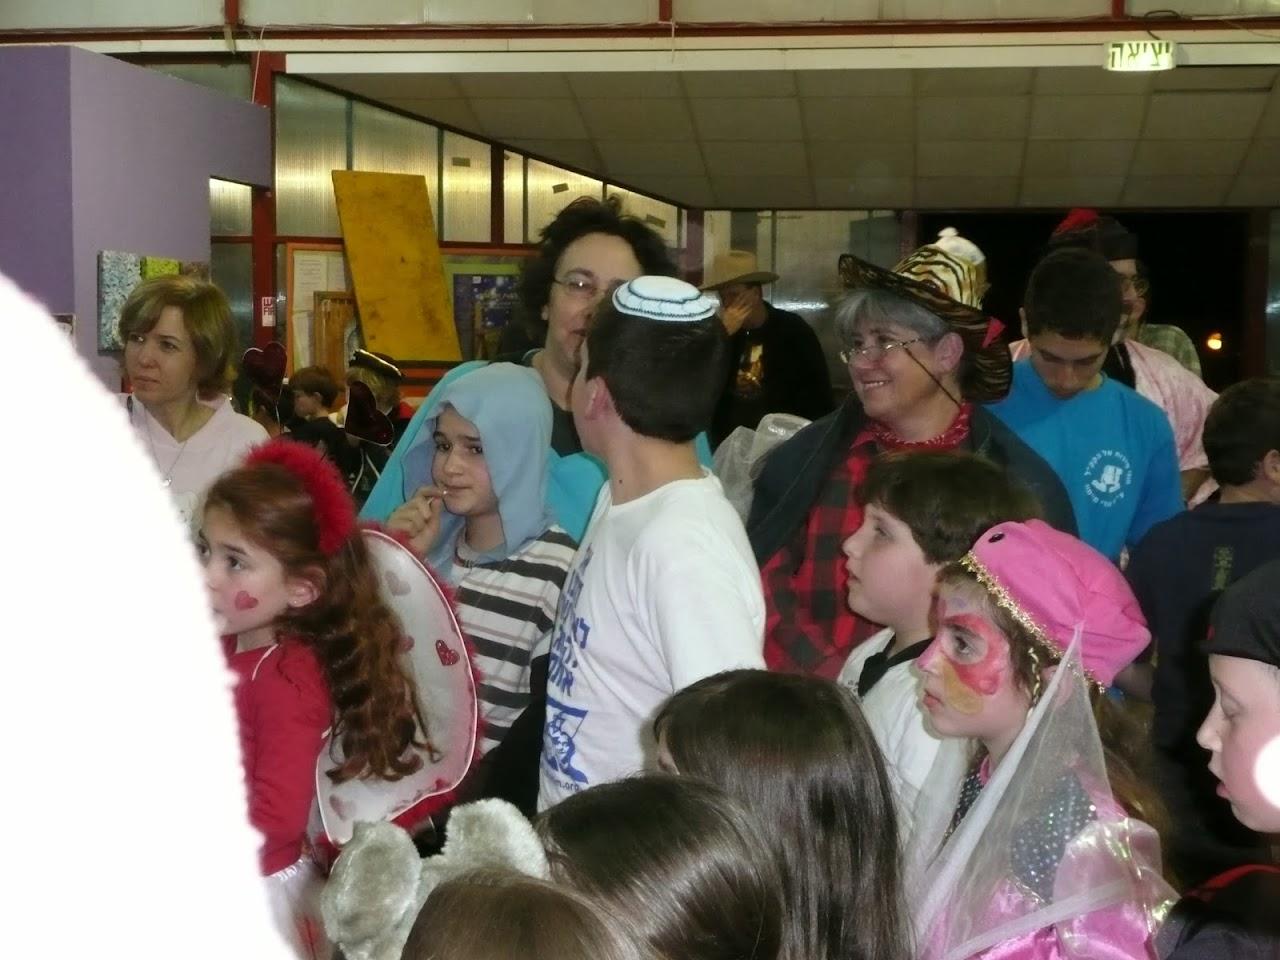 Purim 2008  - 2008-03-20 20.41.53.jpg